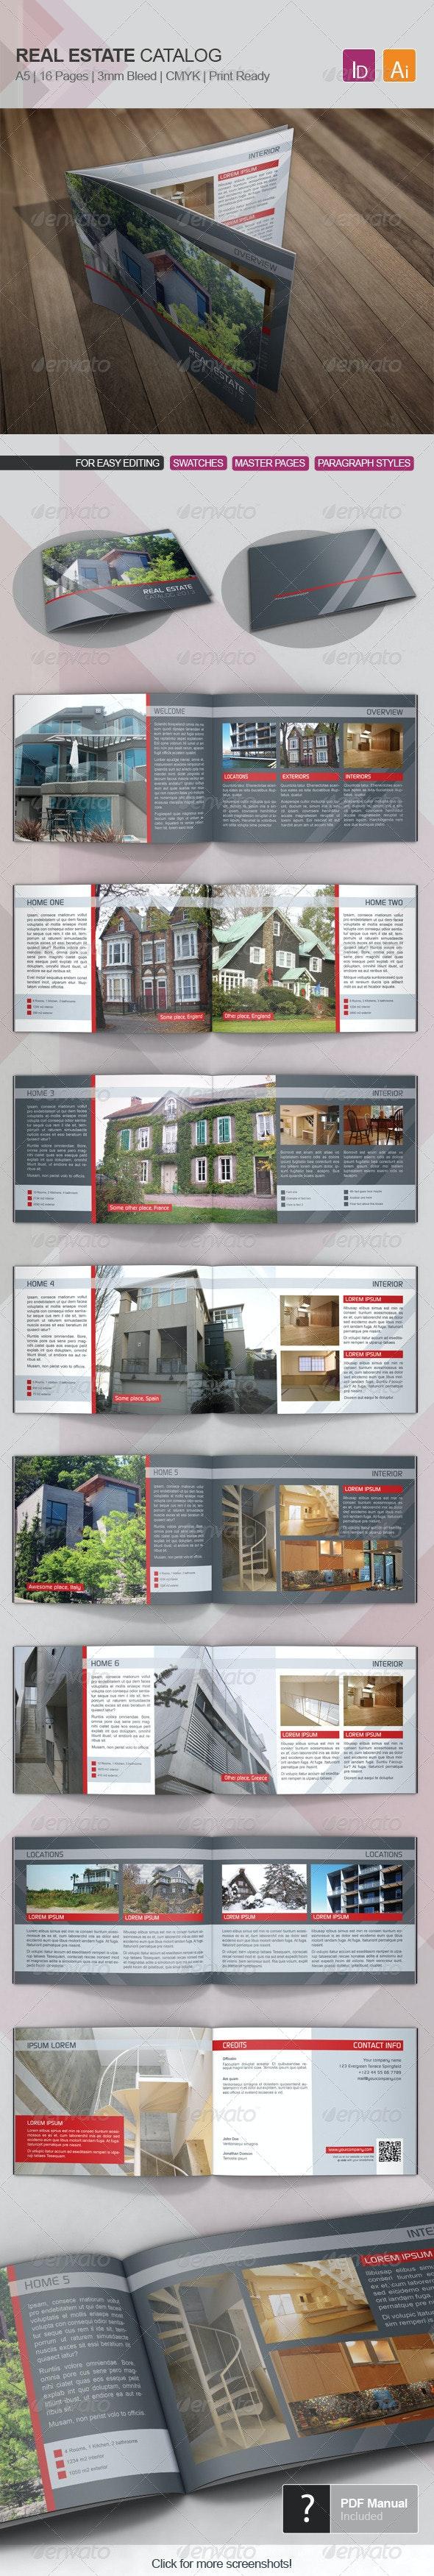 Real Estate Catalog Template 01 - Catalogs Brochures